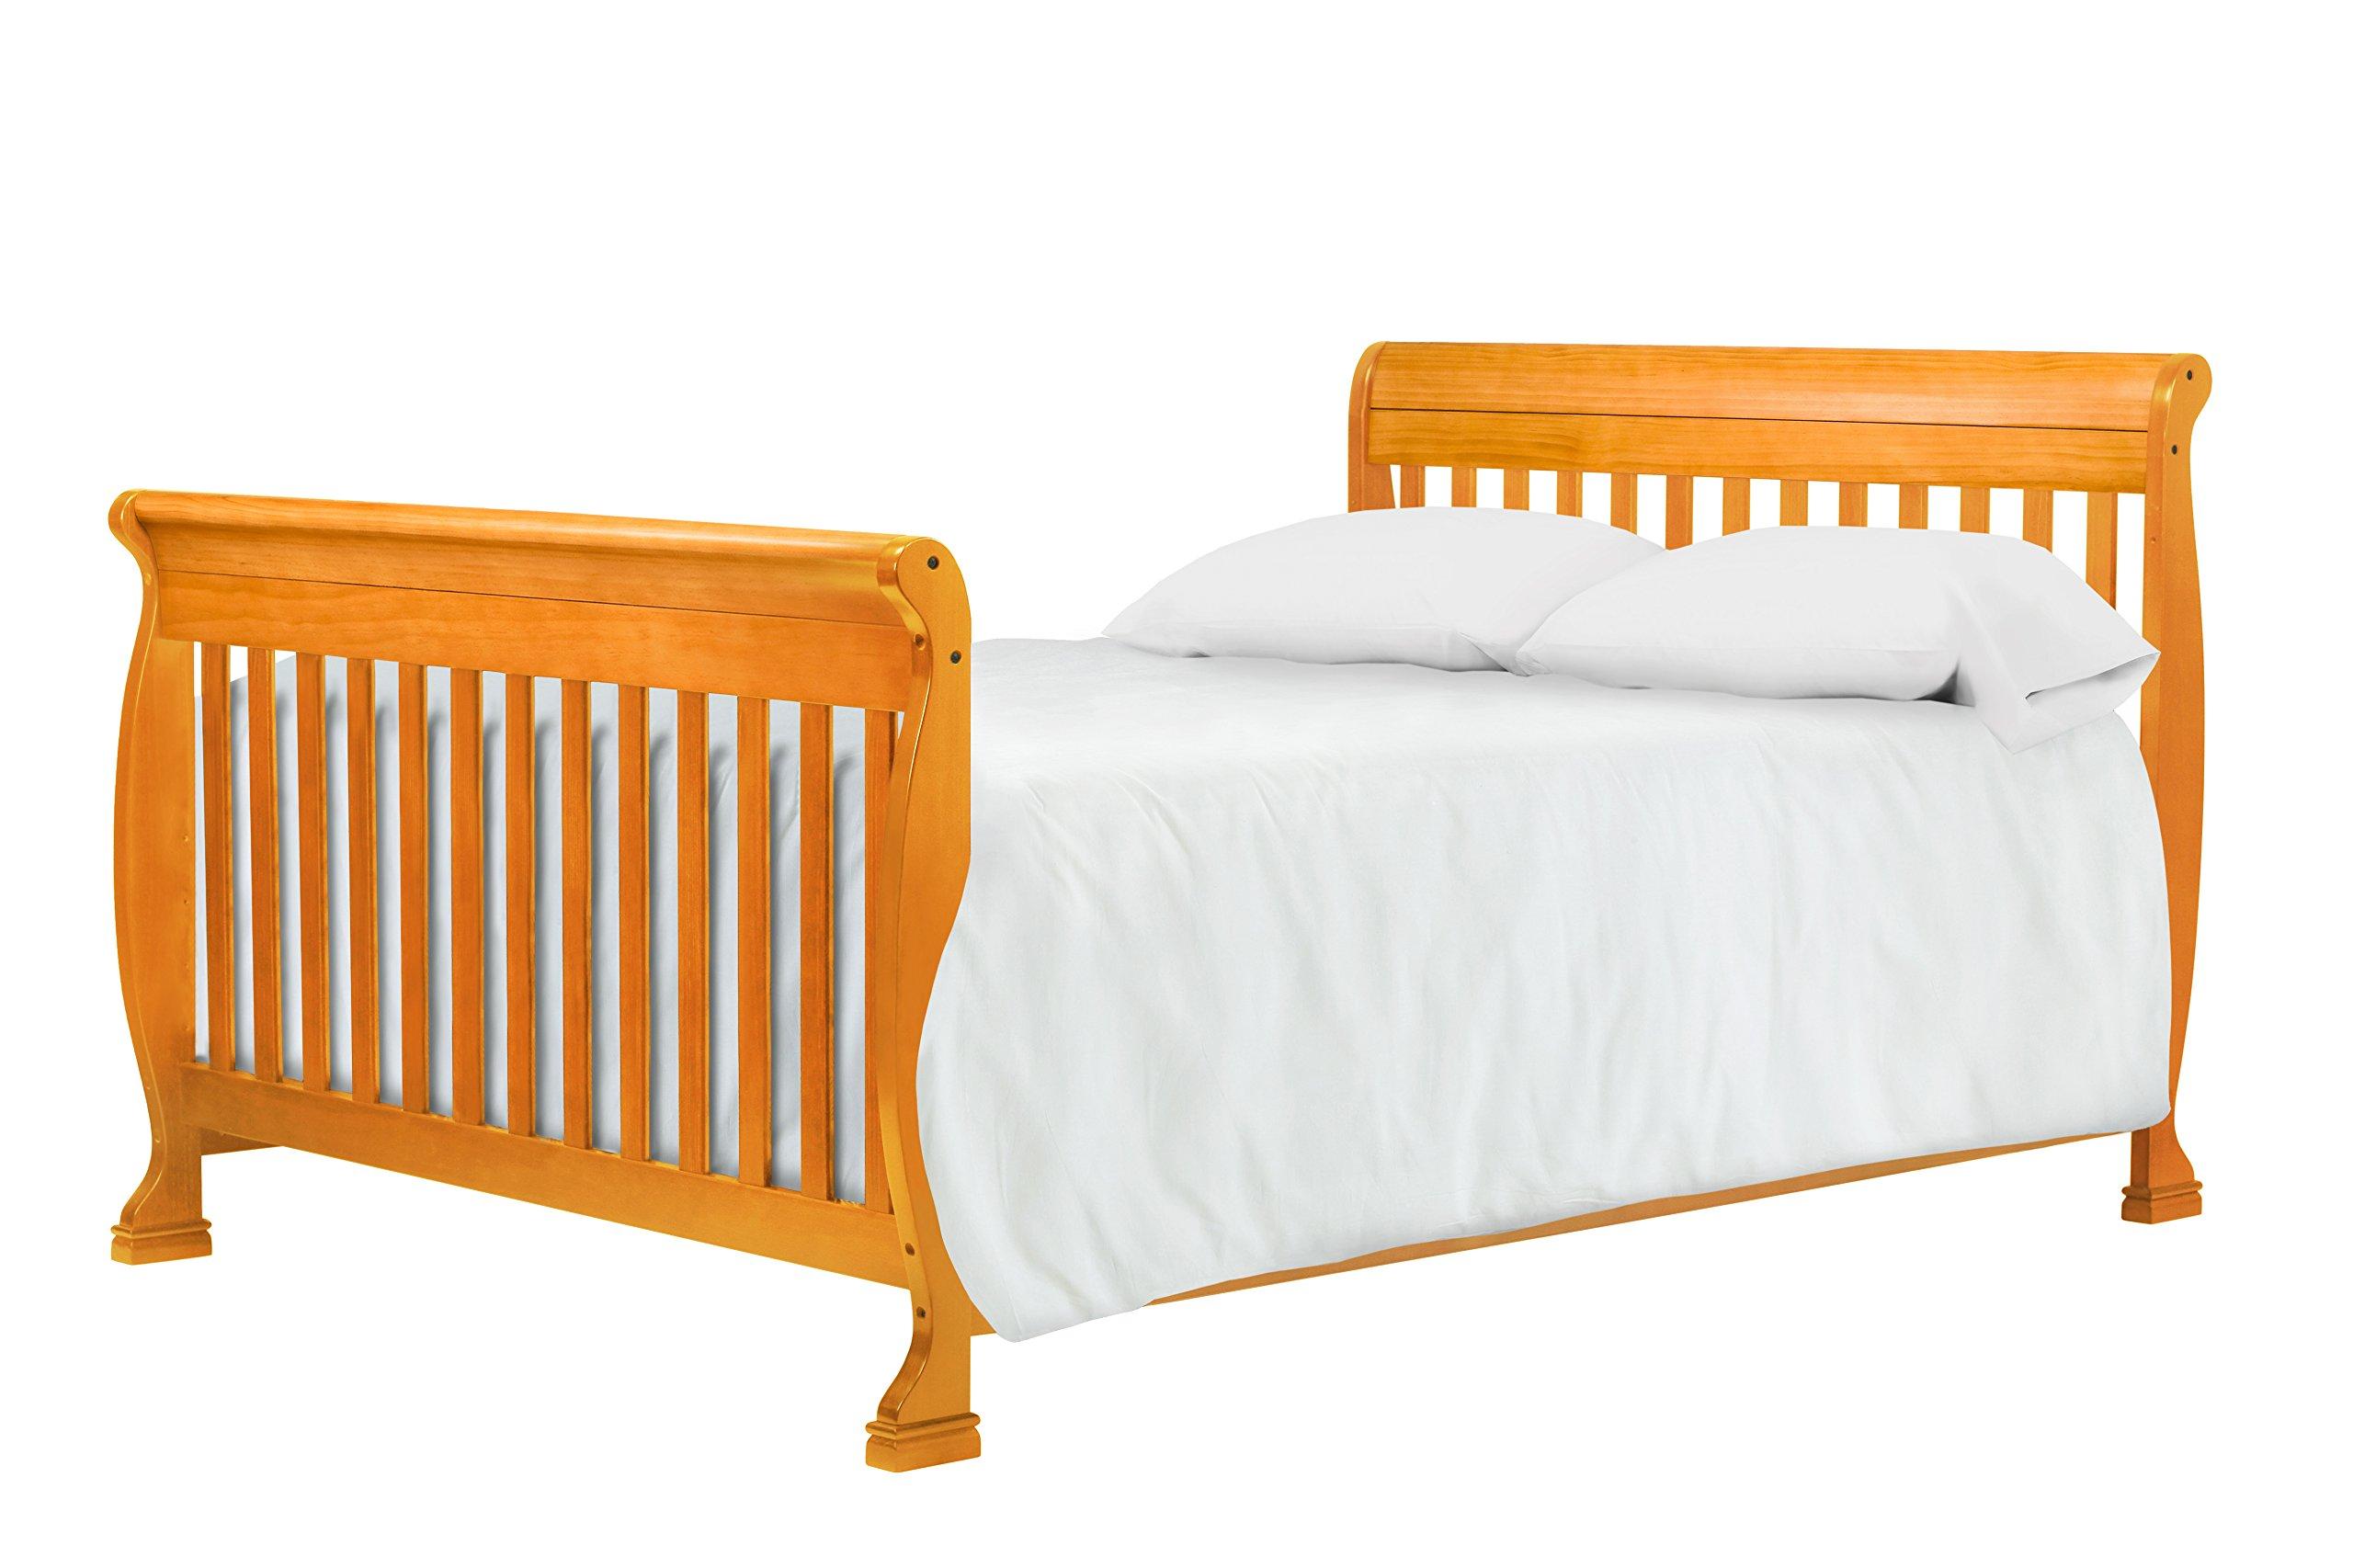 DaVinci Kalani 4-In-1 Convertible Crib, Honey Oak by DaVinci (Image #10)